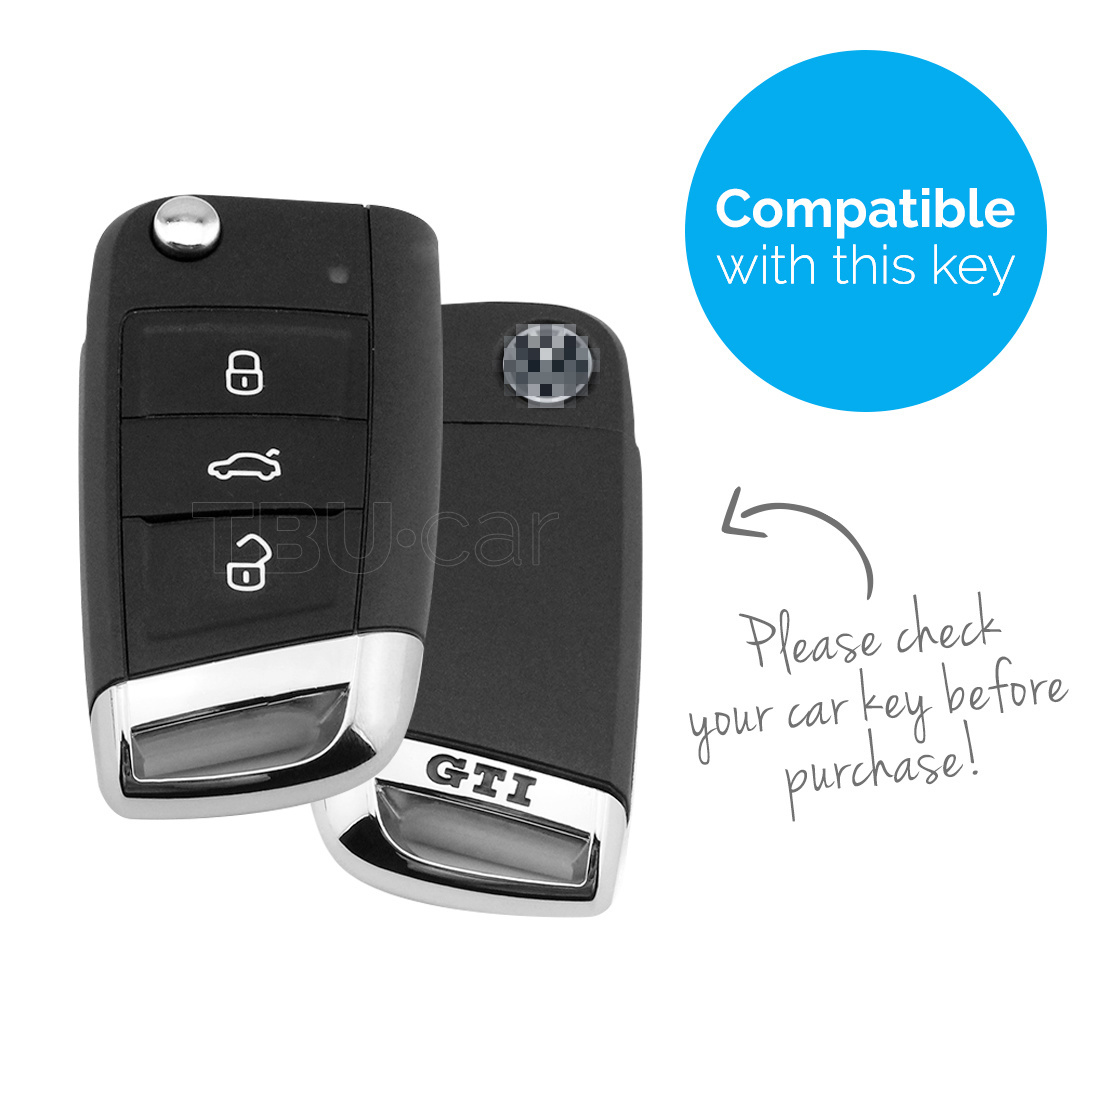 TBU car TBU car Autoschlüssel Hülle kompatibel mit VW GTI / R-Line 3 Tasten - Schutzhülle aus Silikon - Auto Schlüsselhülle Cover in Violett